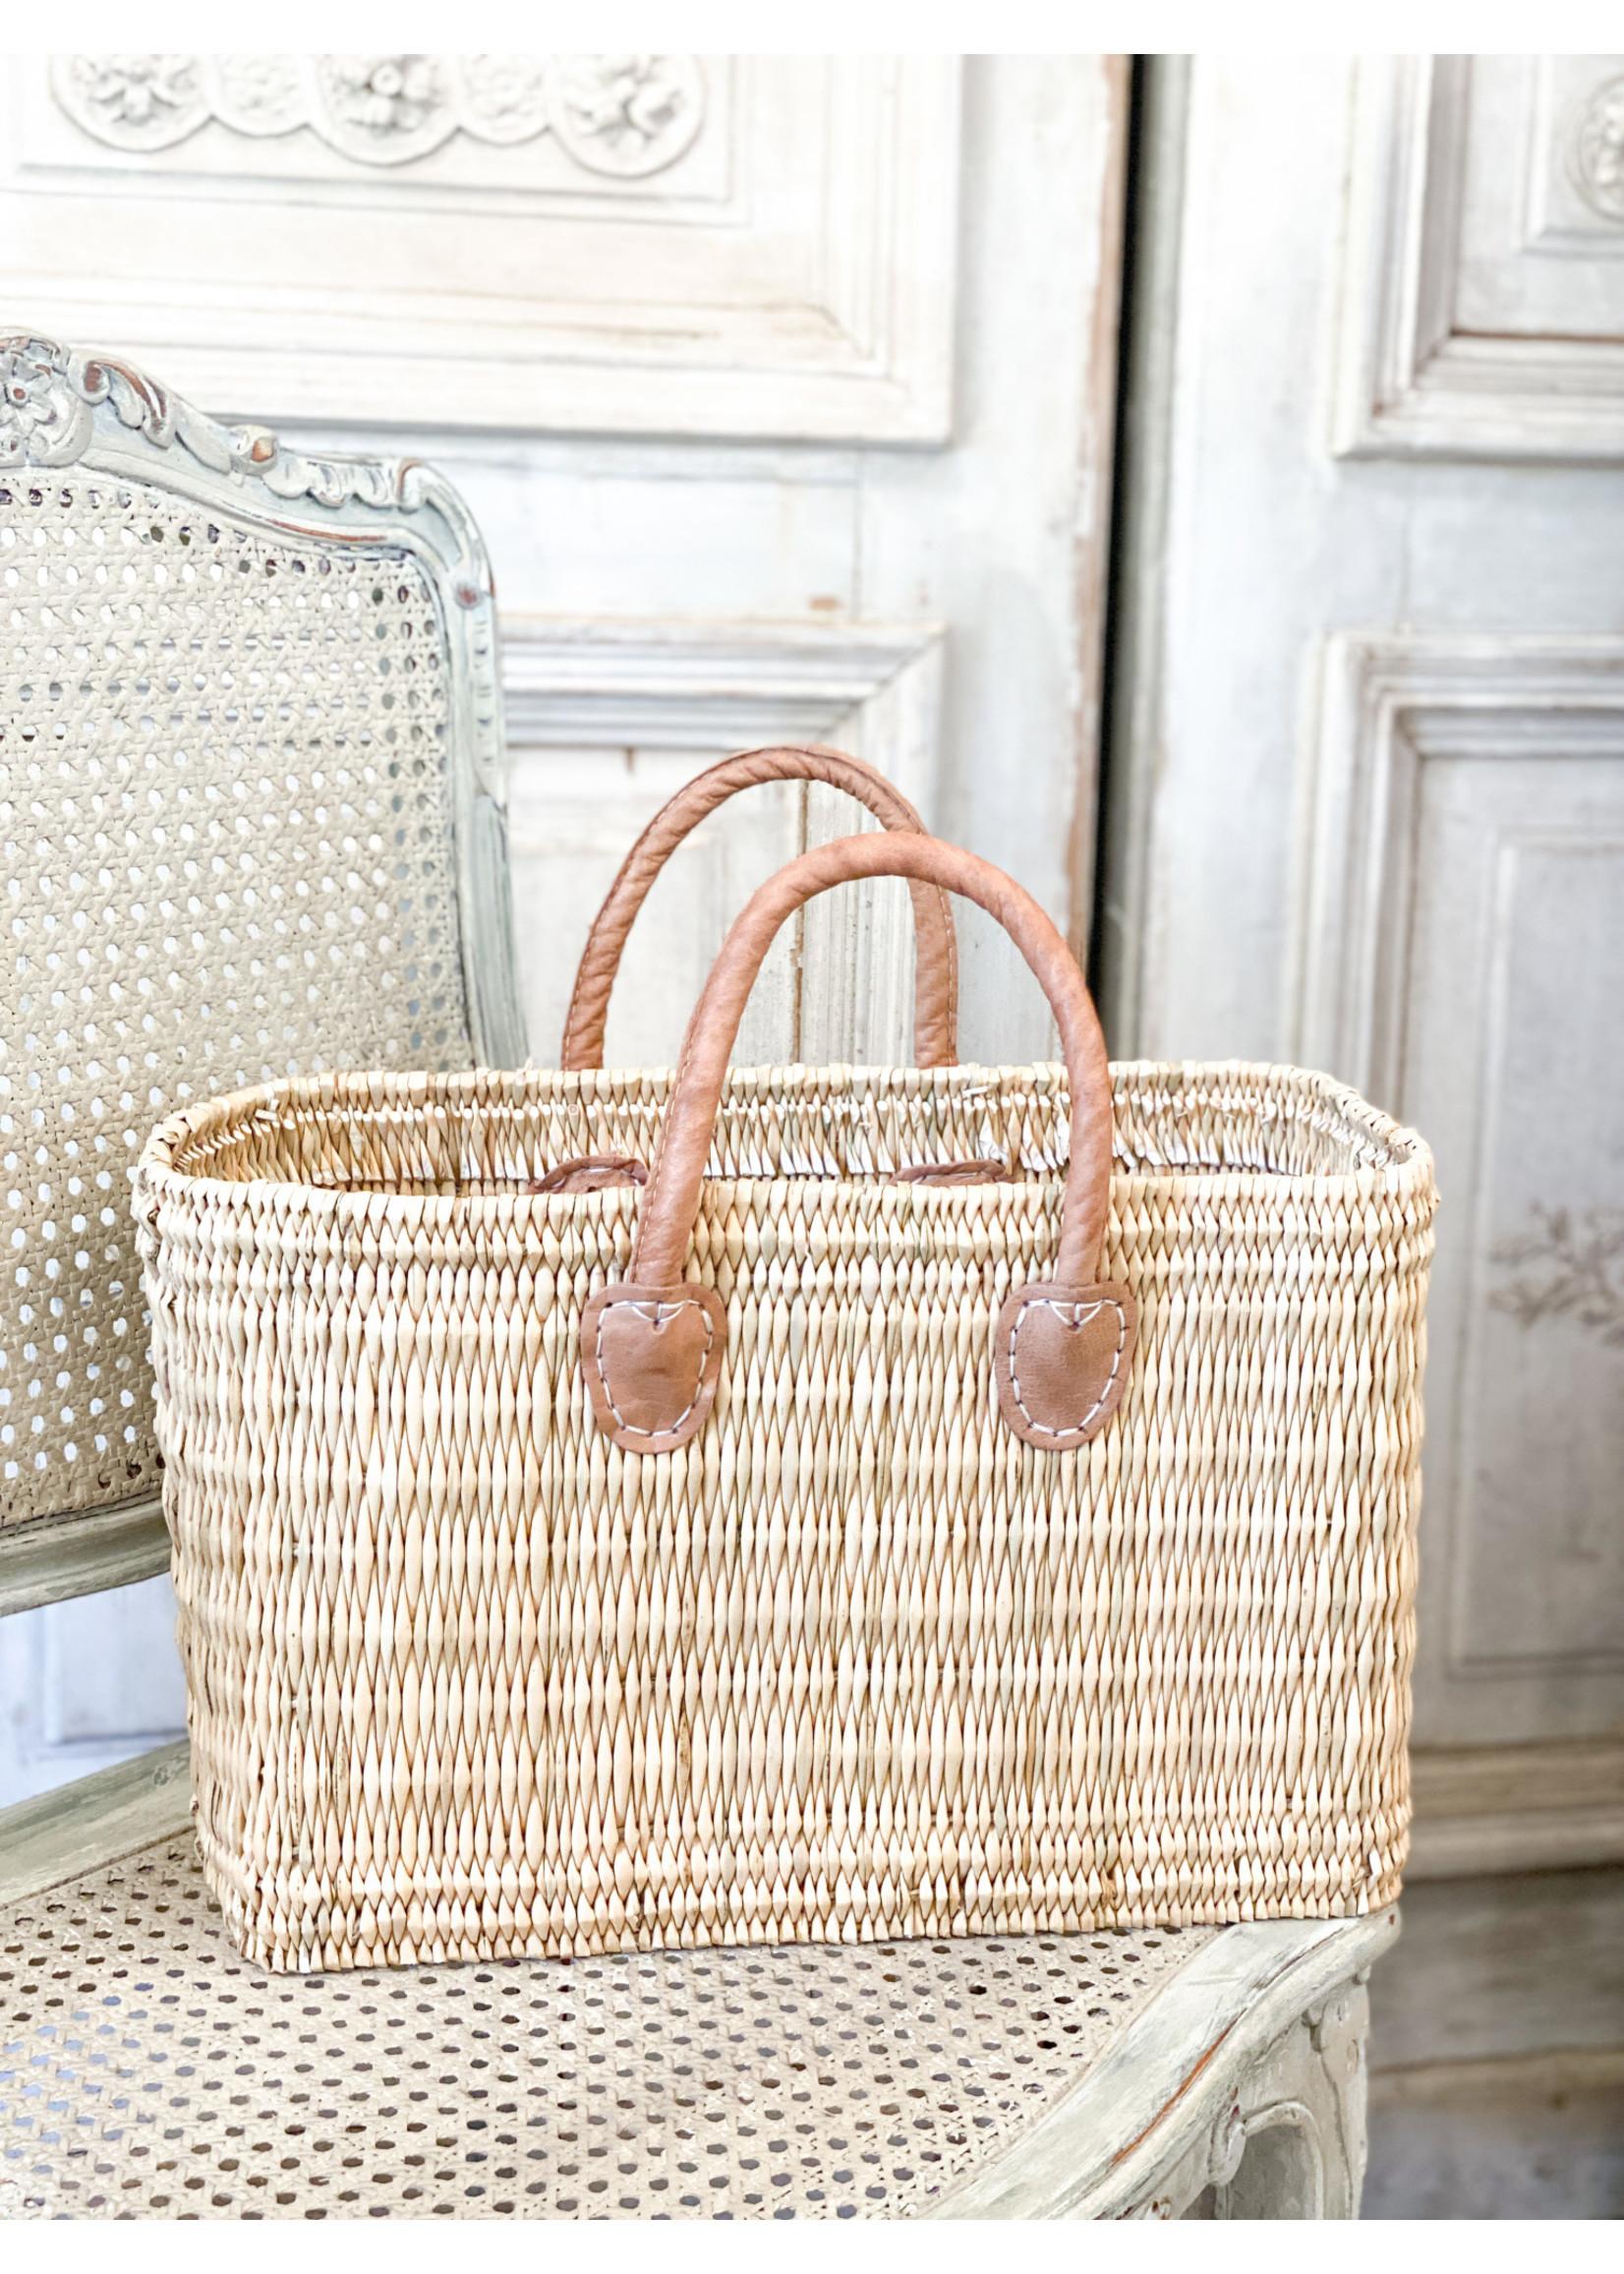 French Market Tote - Tatami Shopper Small